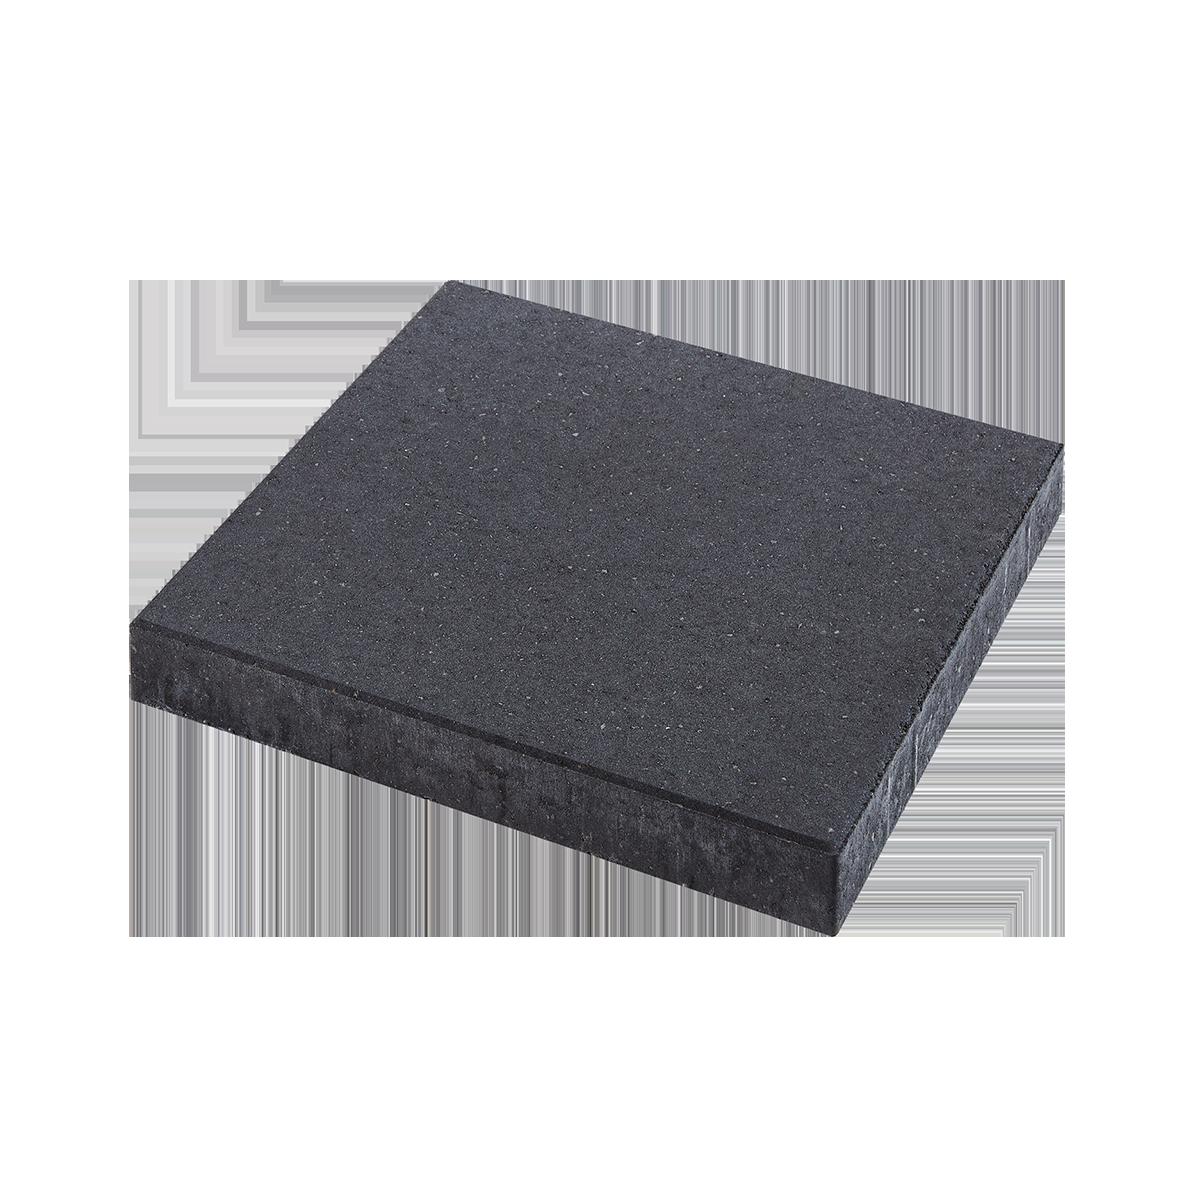 Fliser 50x50x6 cm Sort/Antracit